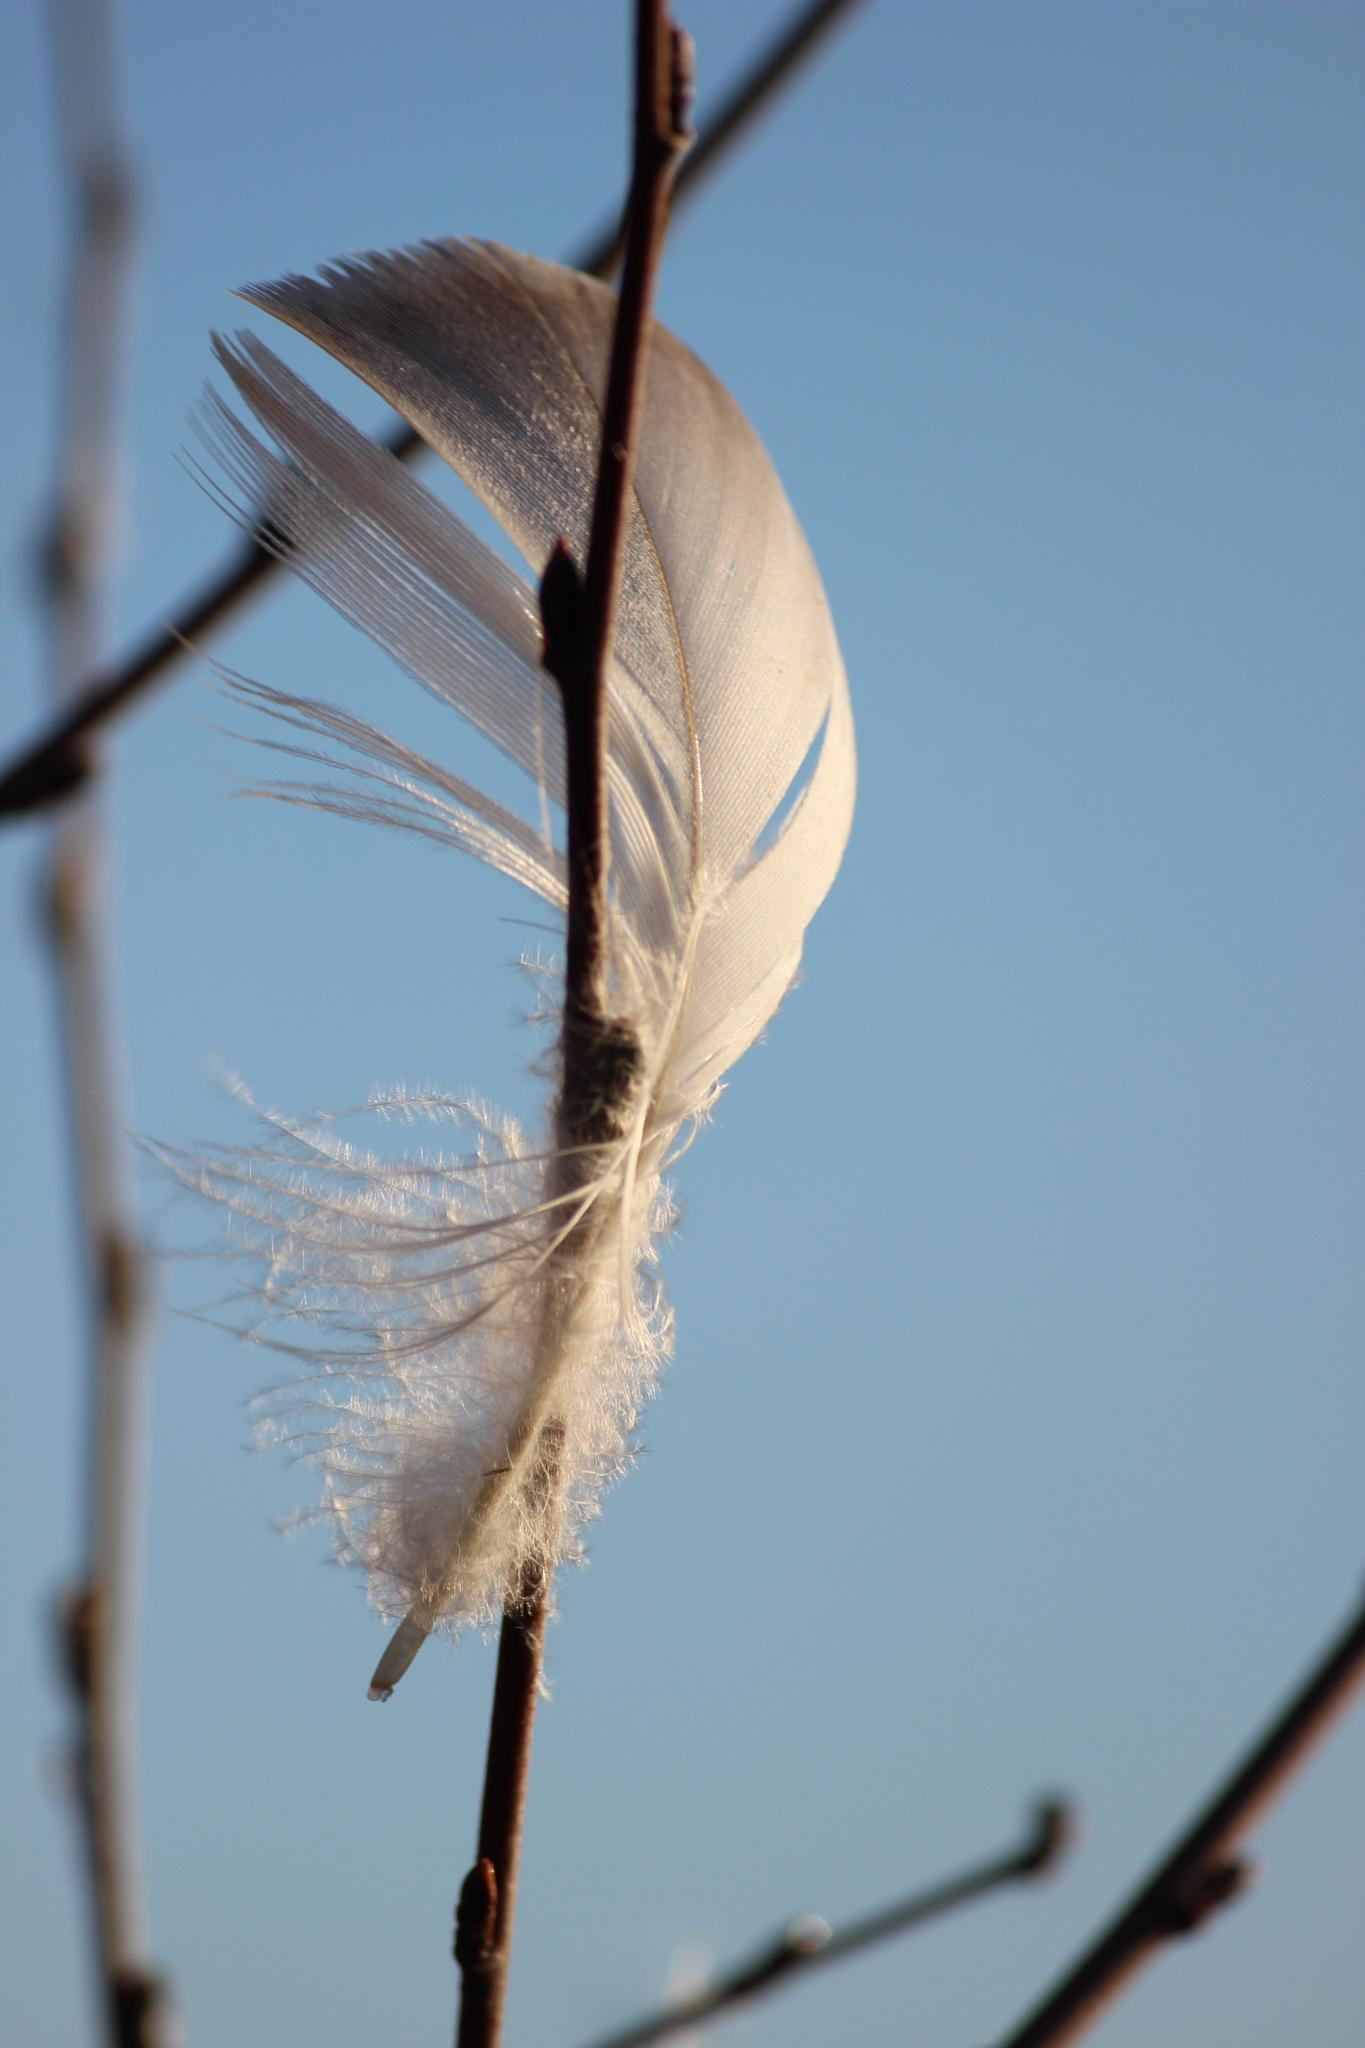 Feather by pernillamia